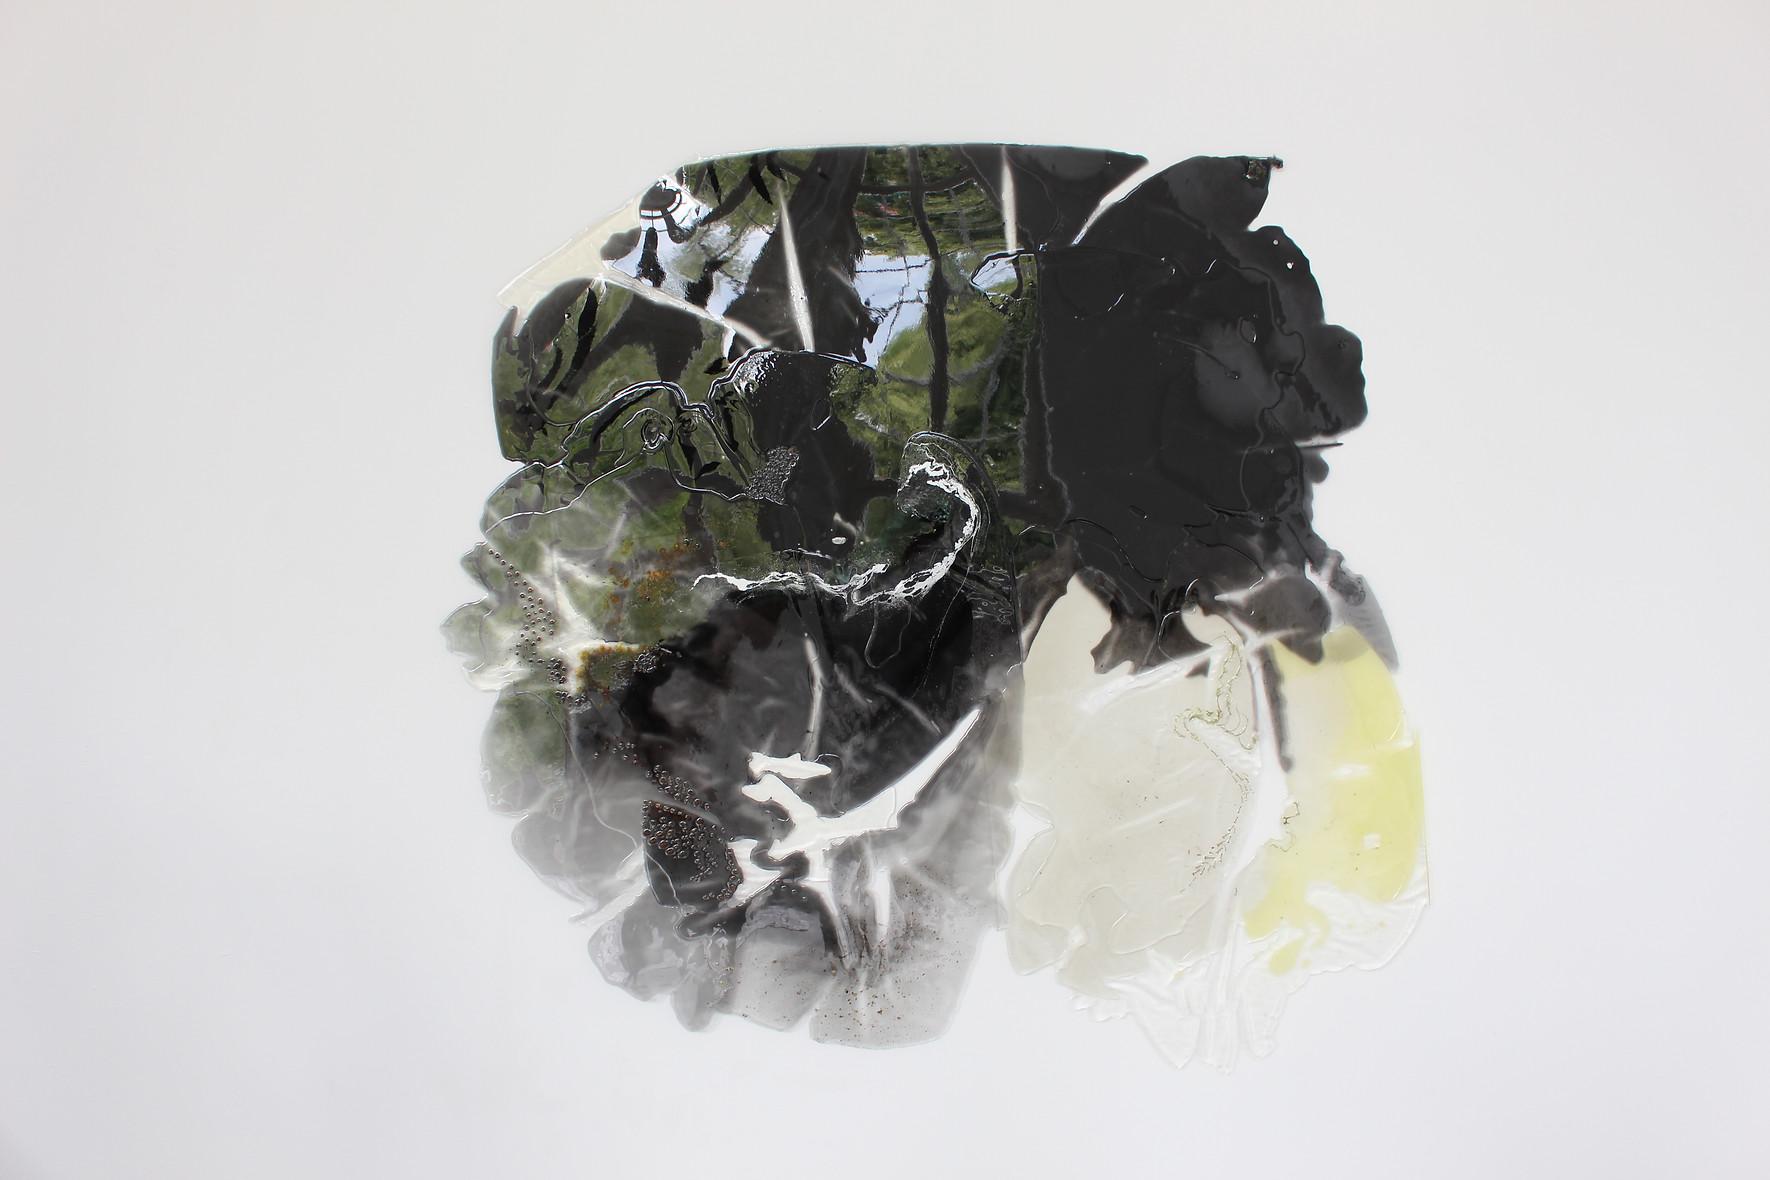 Mikro- & Makrokosmos, 2019, 175cm x 175cm, Epoxidharz, Pigmente, Fundstücke